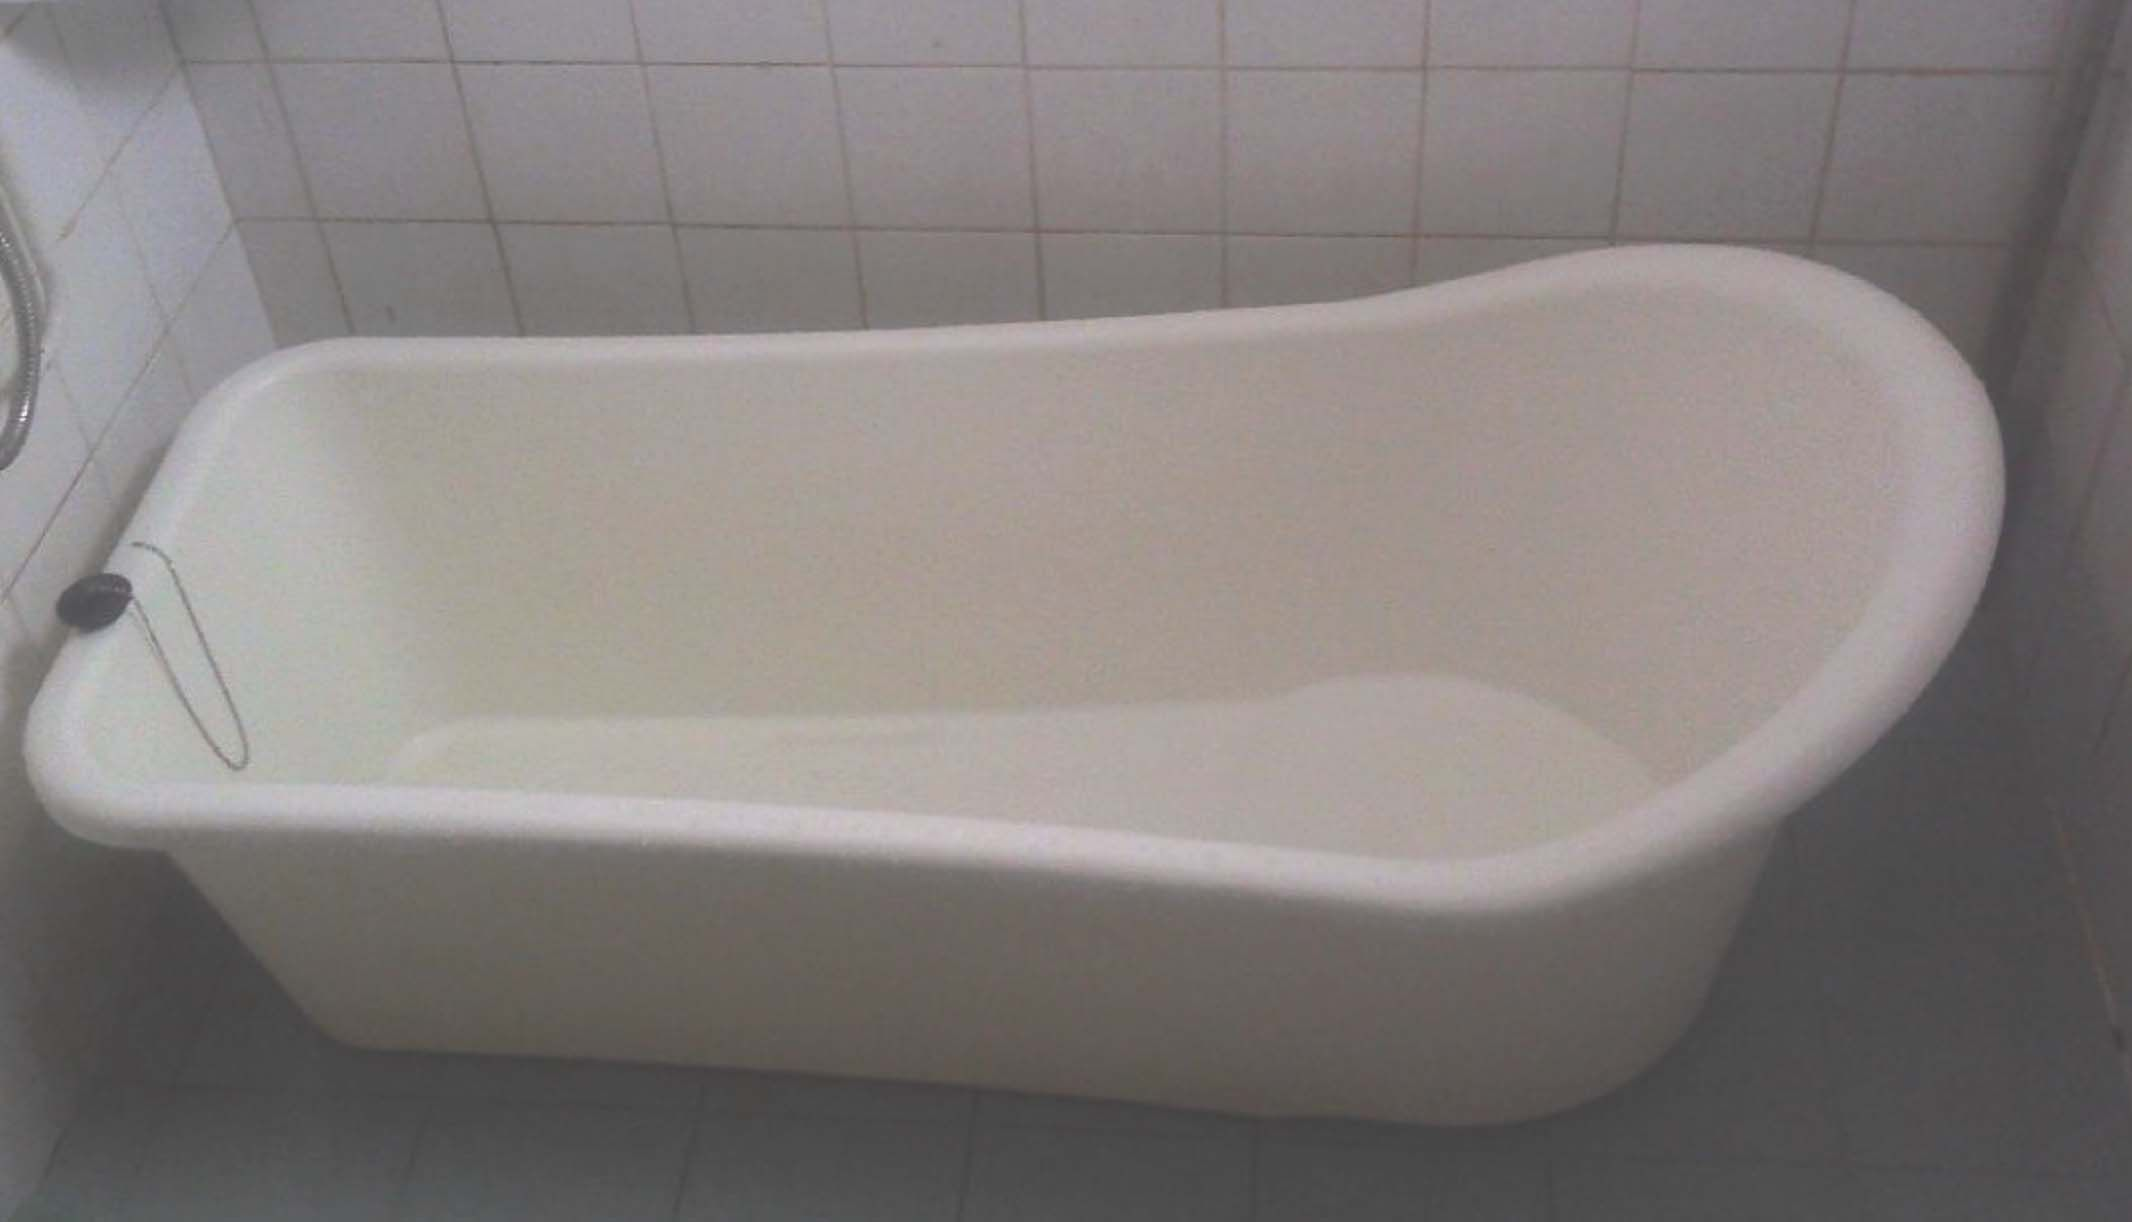 White Long Portable Bathtub For The Home Pinterest